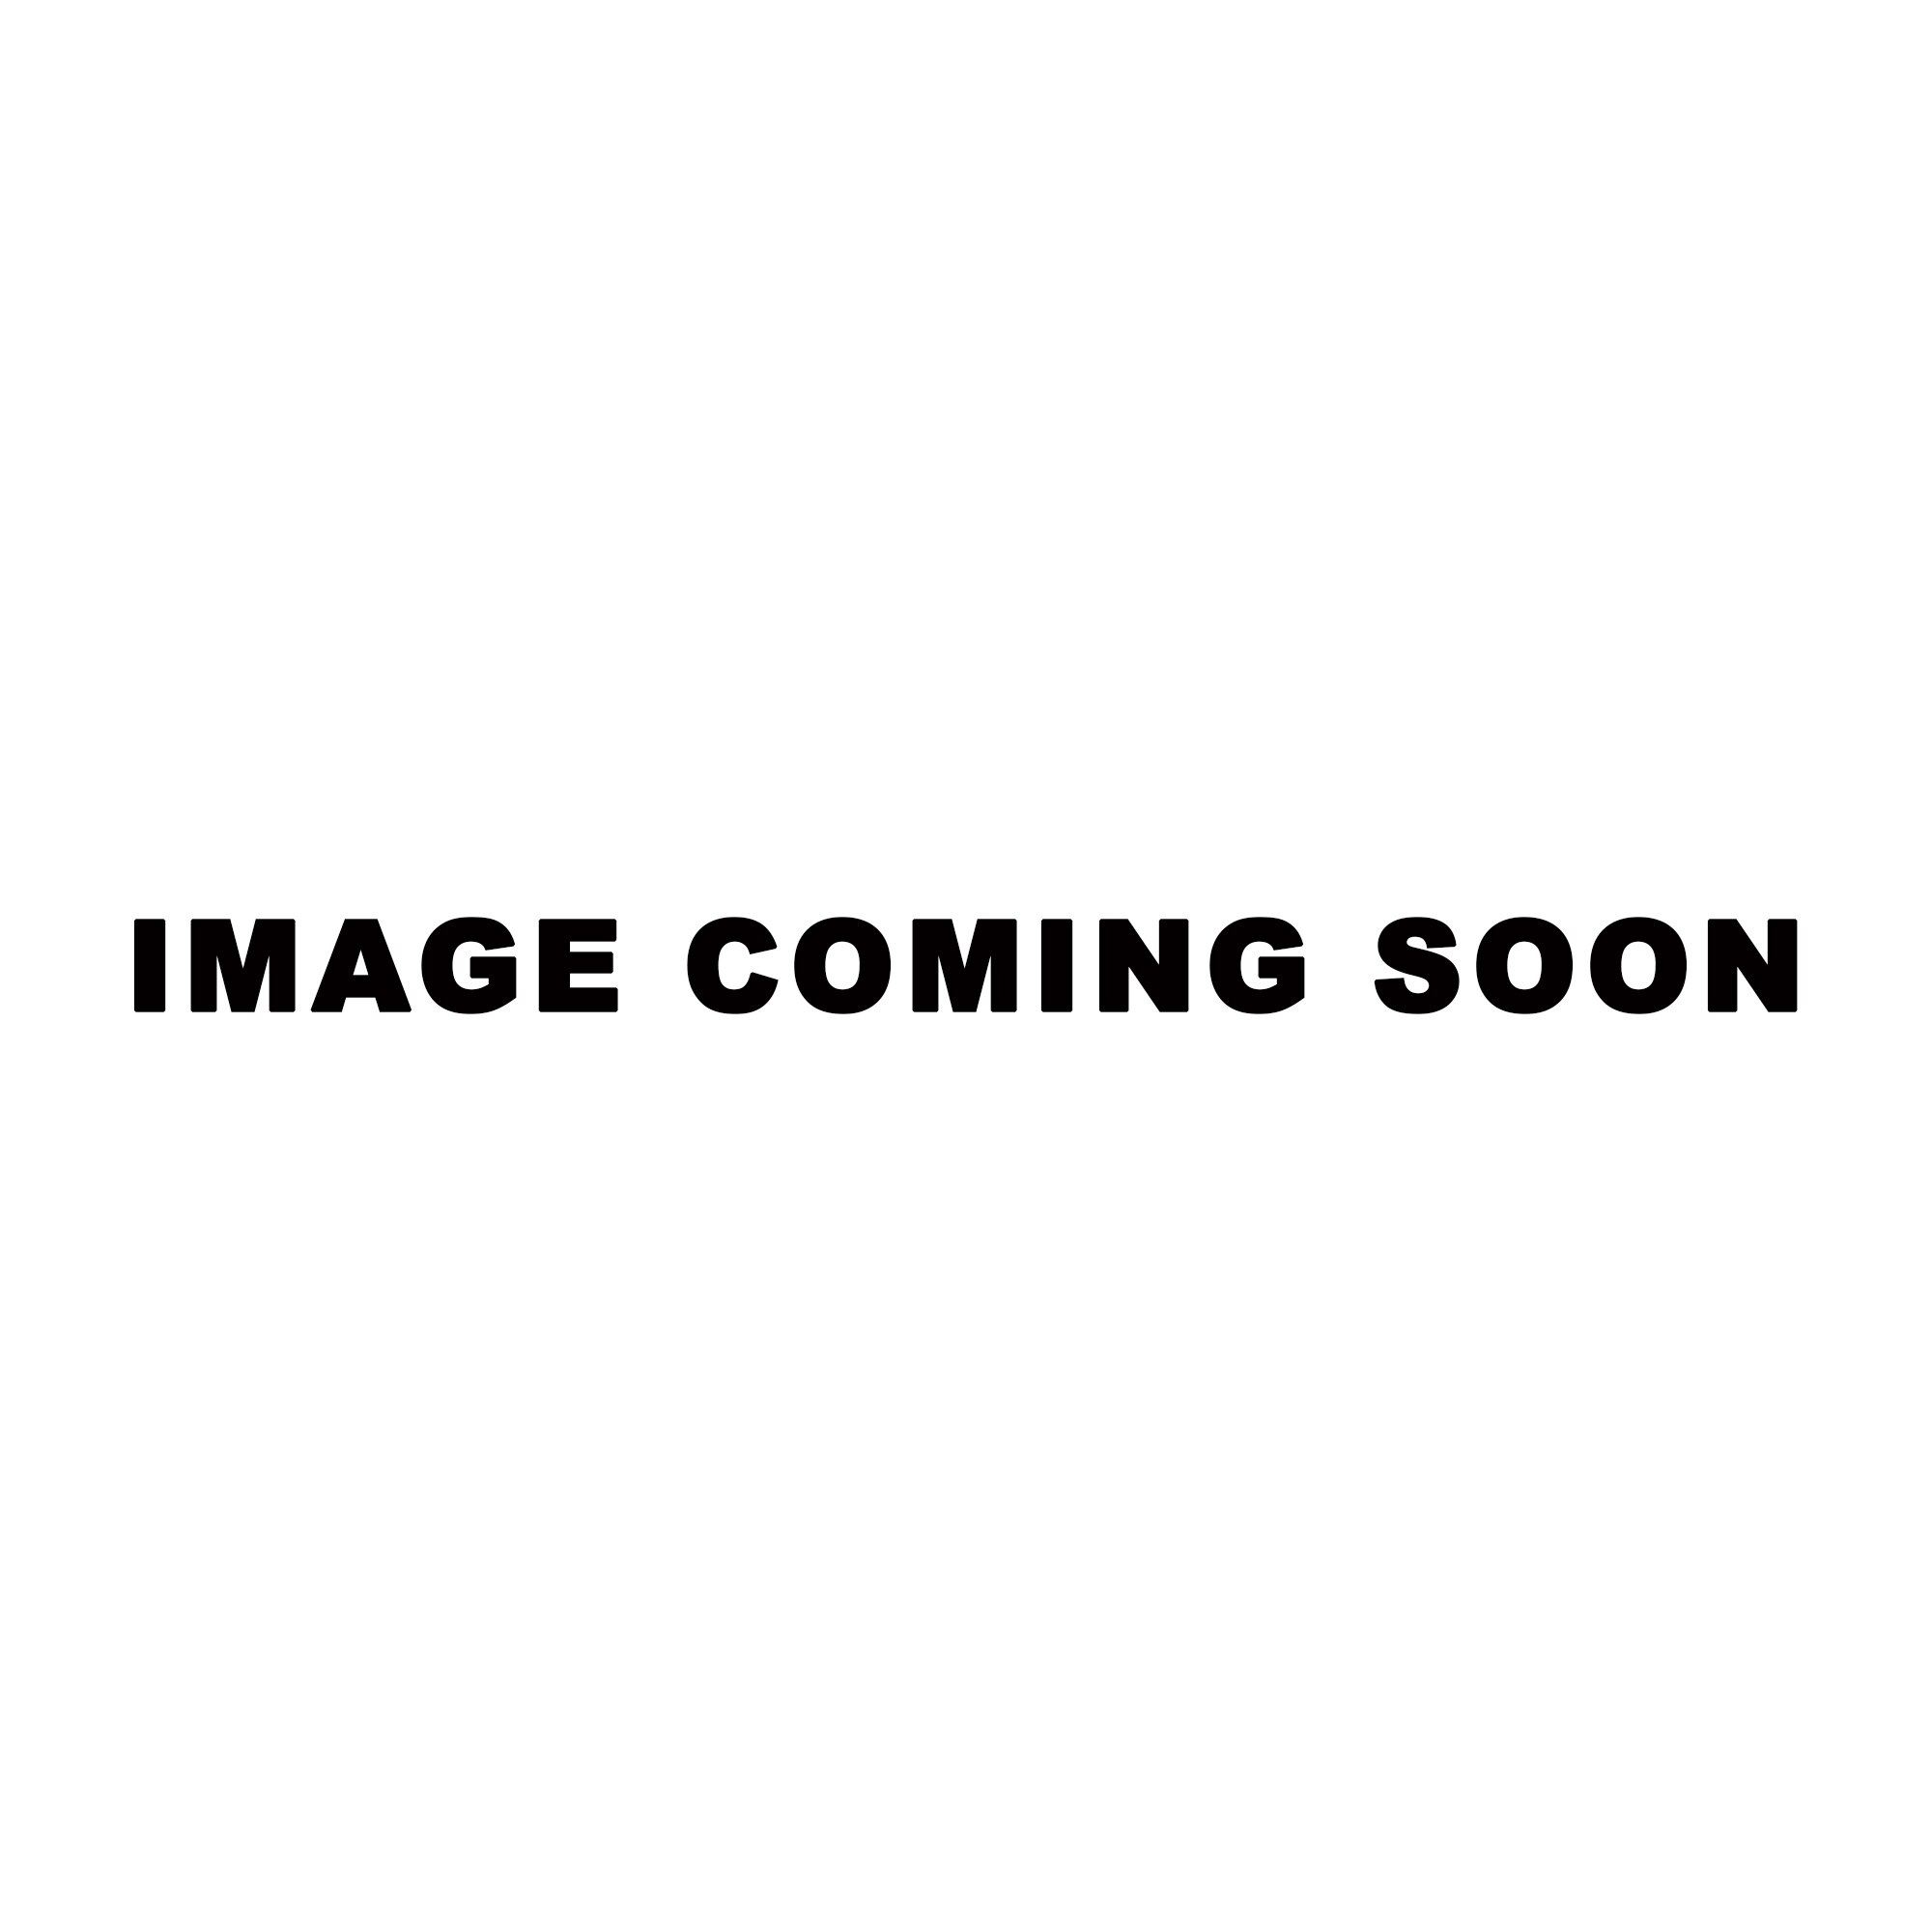 Usc Trojans Metallic Freeform Logo Auto Emblem